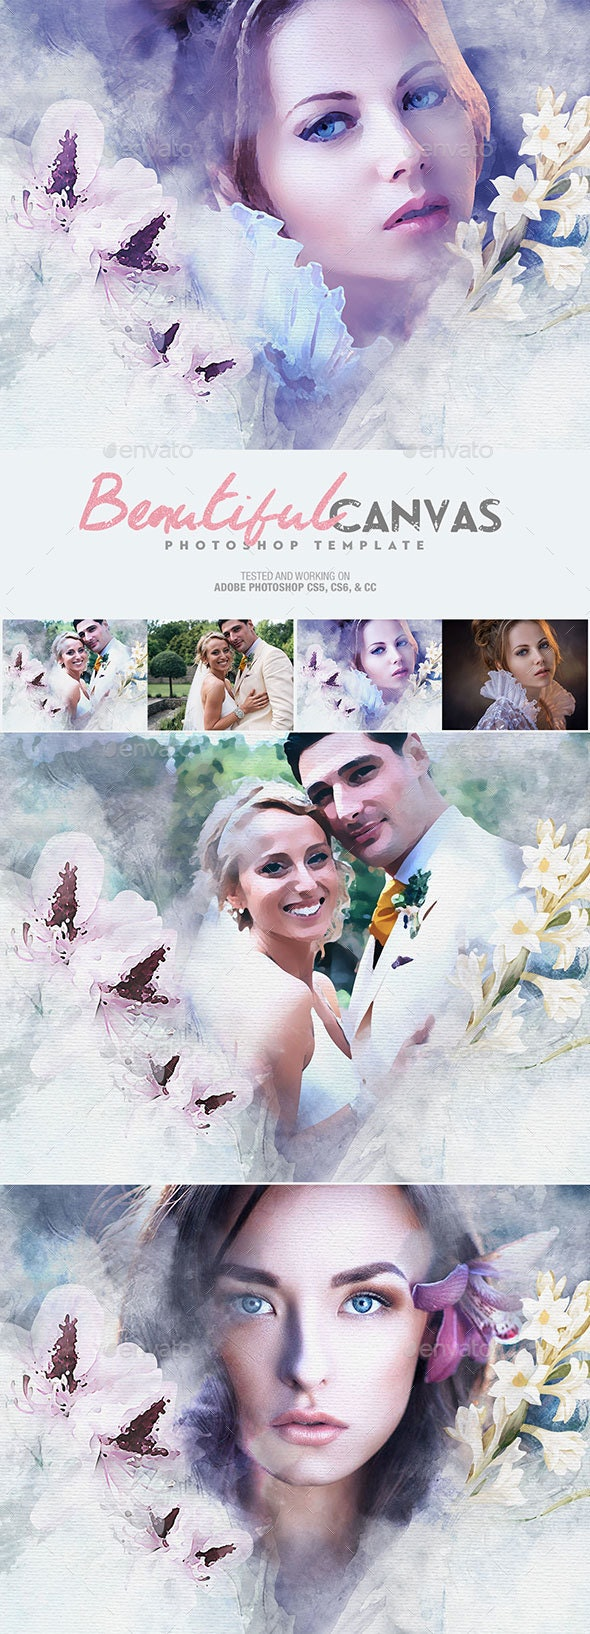 Beautiful Canvas Photoshop Template - Artistic Photo Templates